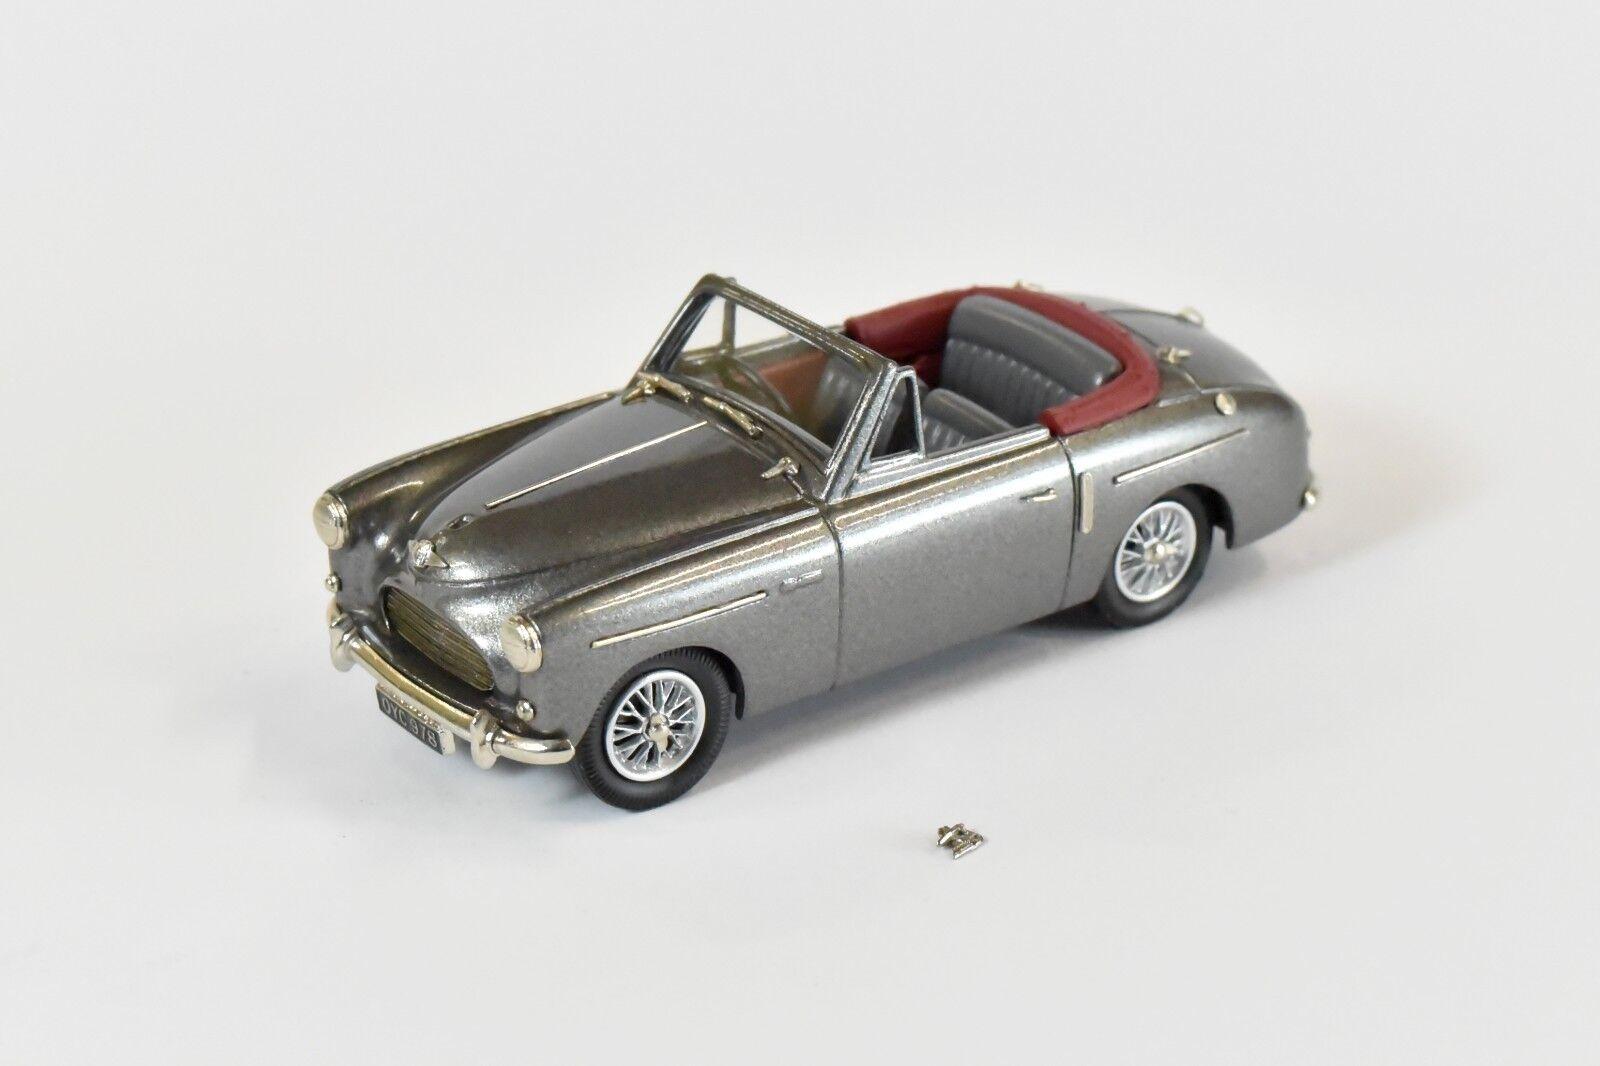 Brooklin modelle 1952 austin a40 - sport - ldm22x